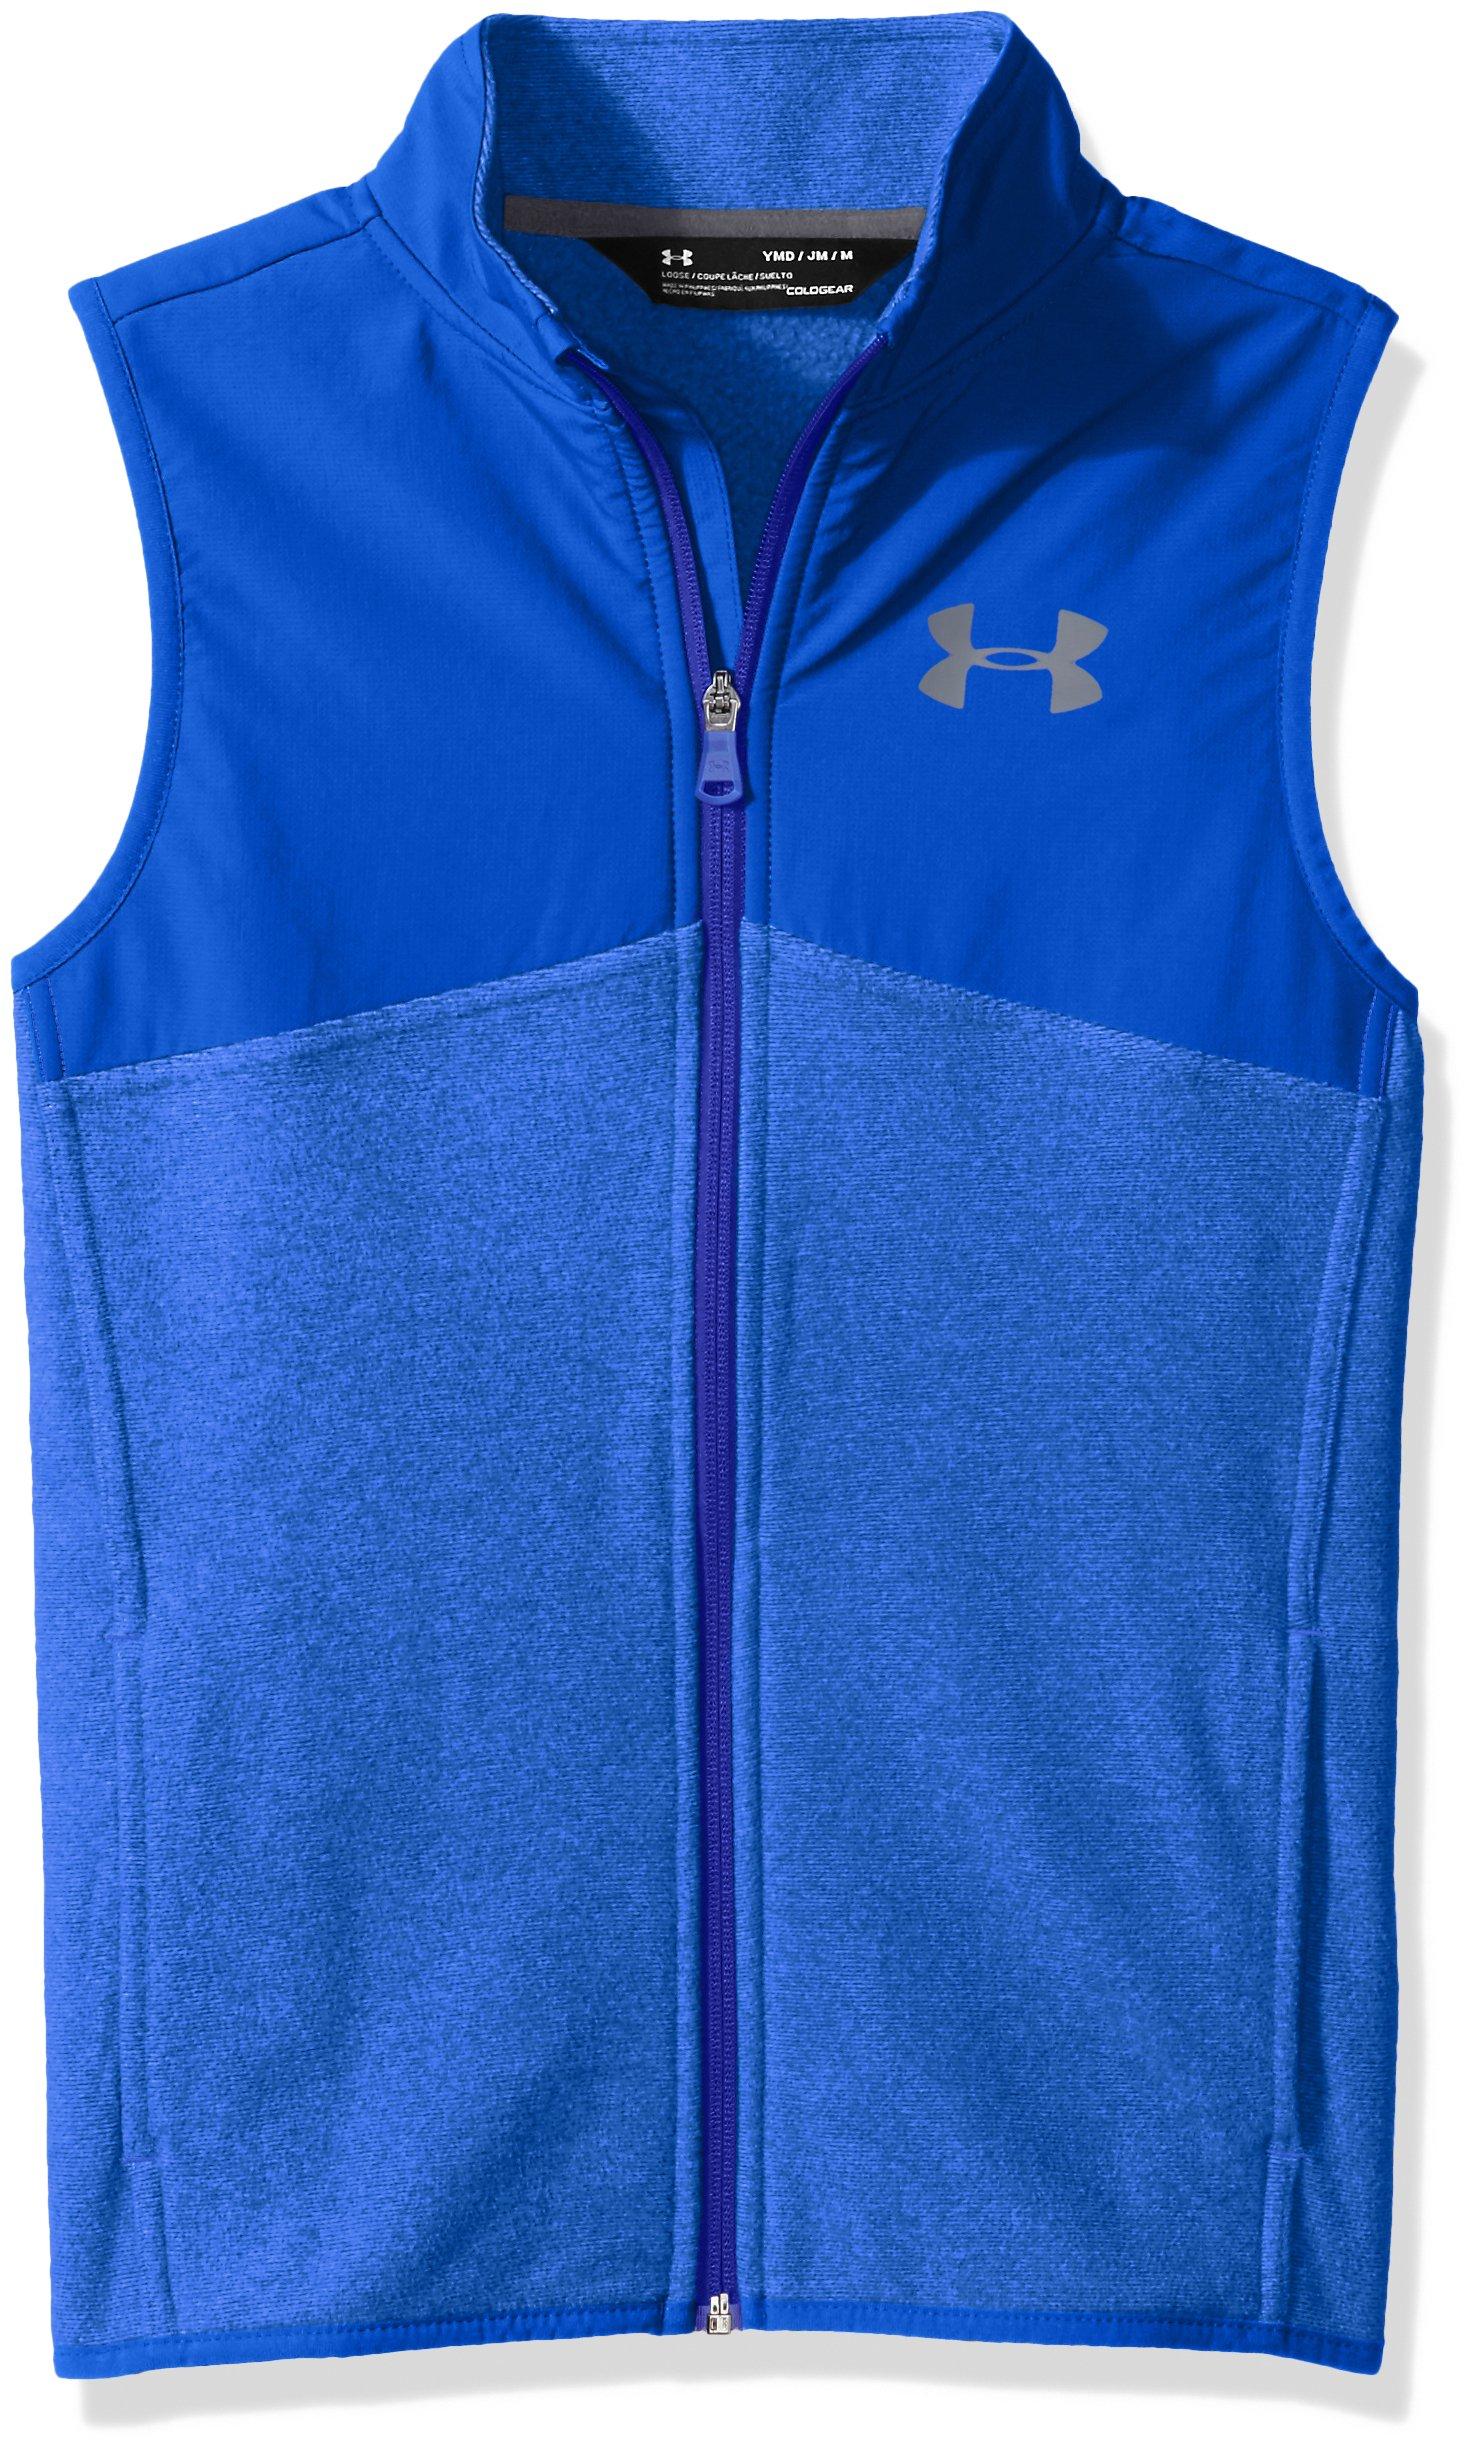 Under Armour Boys' Phenom Vest,Ultra Blue (907)/Graphite, Youth Large